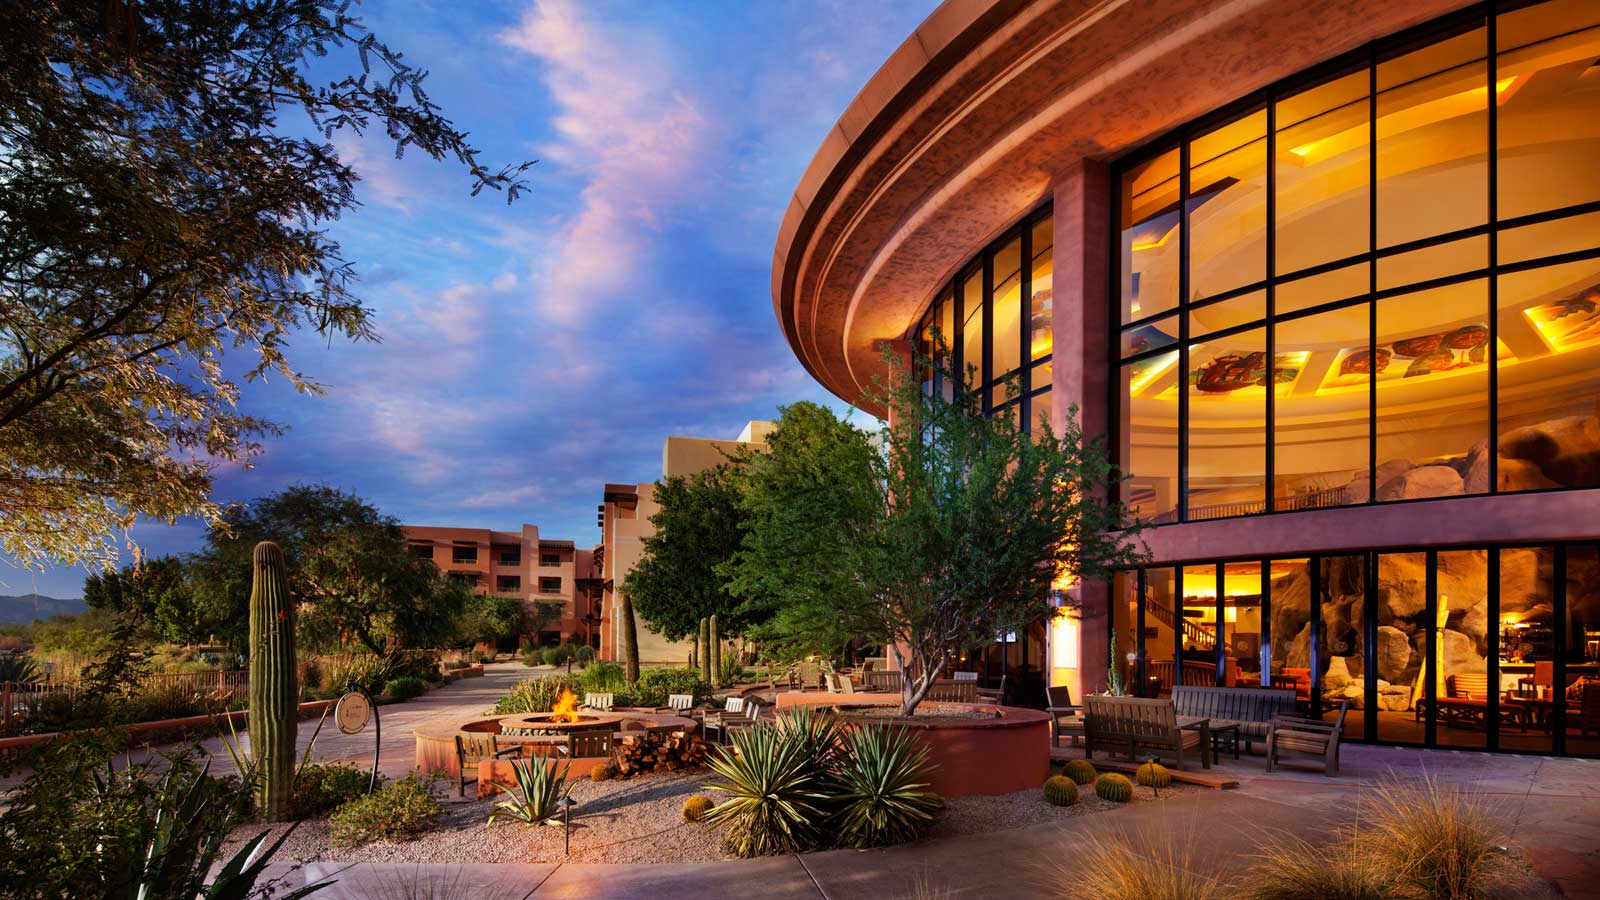 Best Kitchen Gallery: Sheraton Hotels Resorts Recognizes Sheraton Wild Horse Pass Resort of Az Hotels And Resorts  on rachelxblog.com